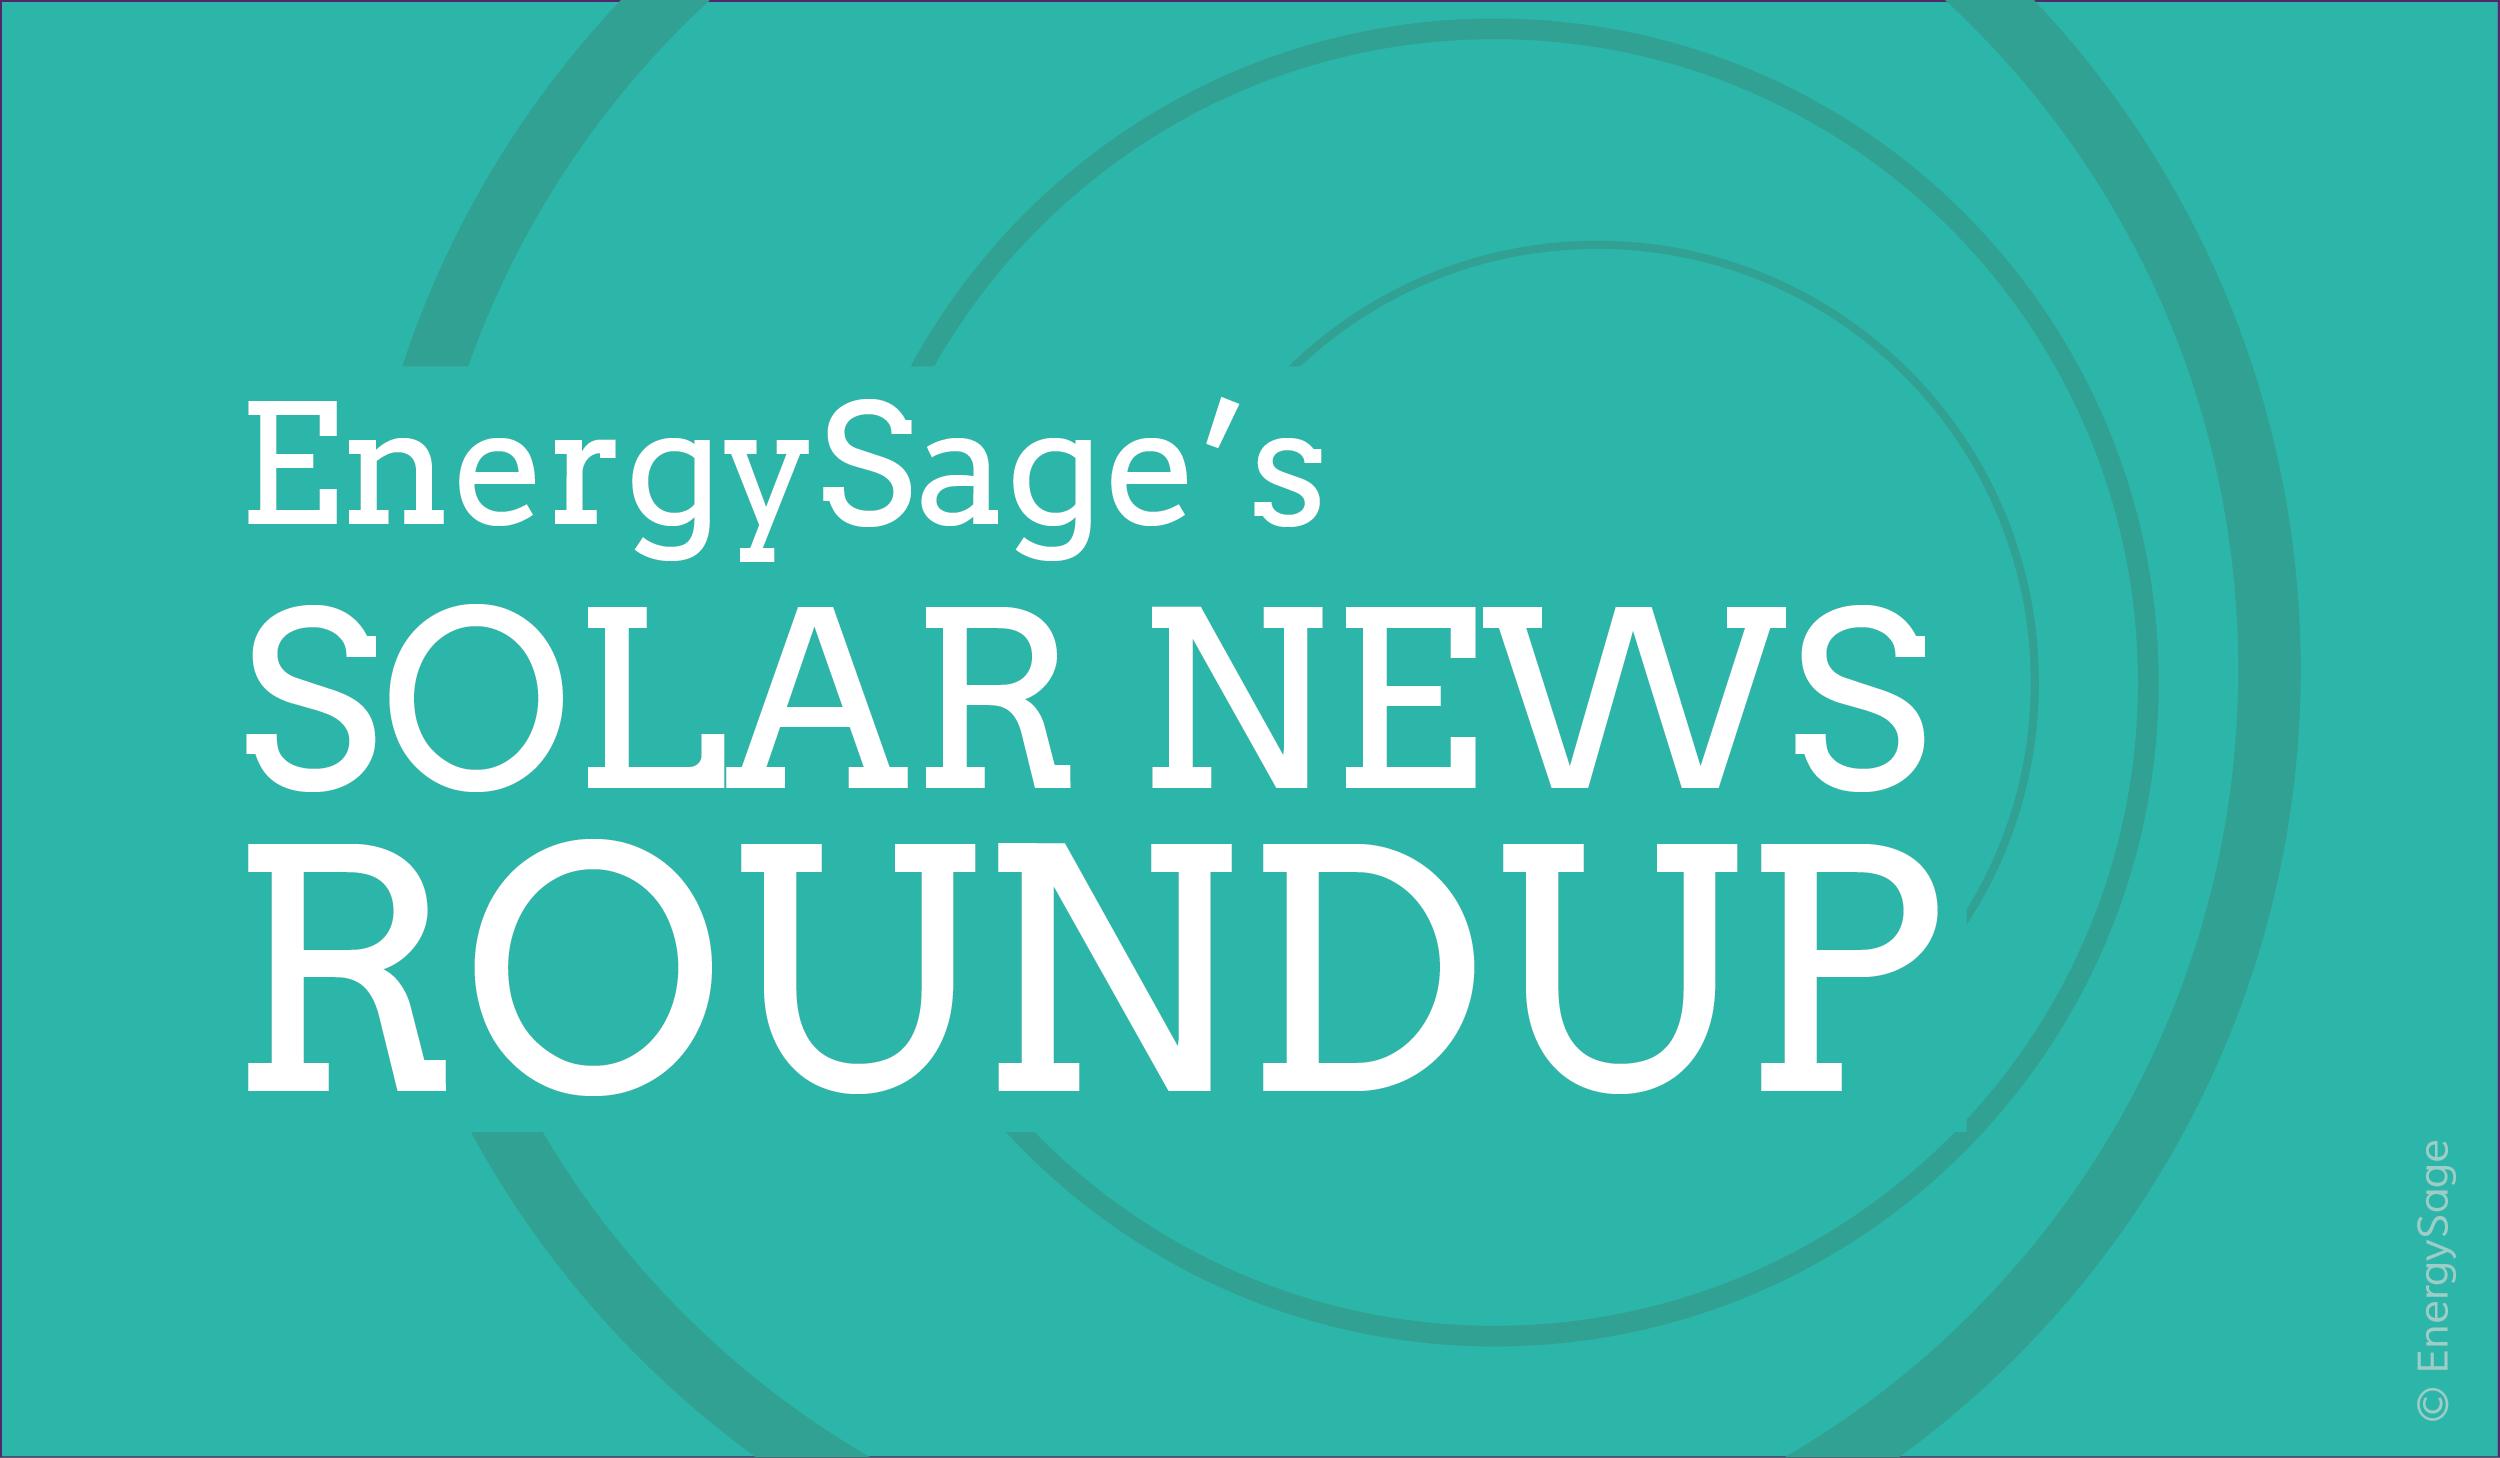 ES_solar_roundup_blog3